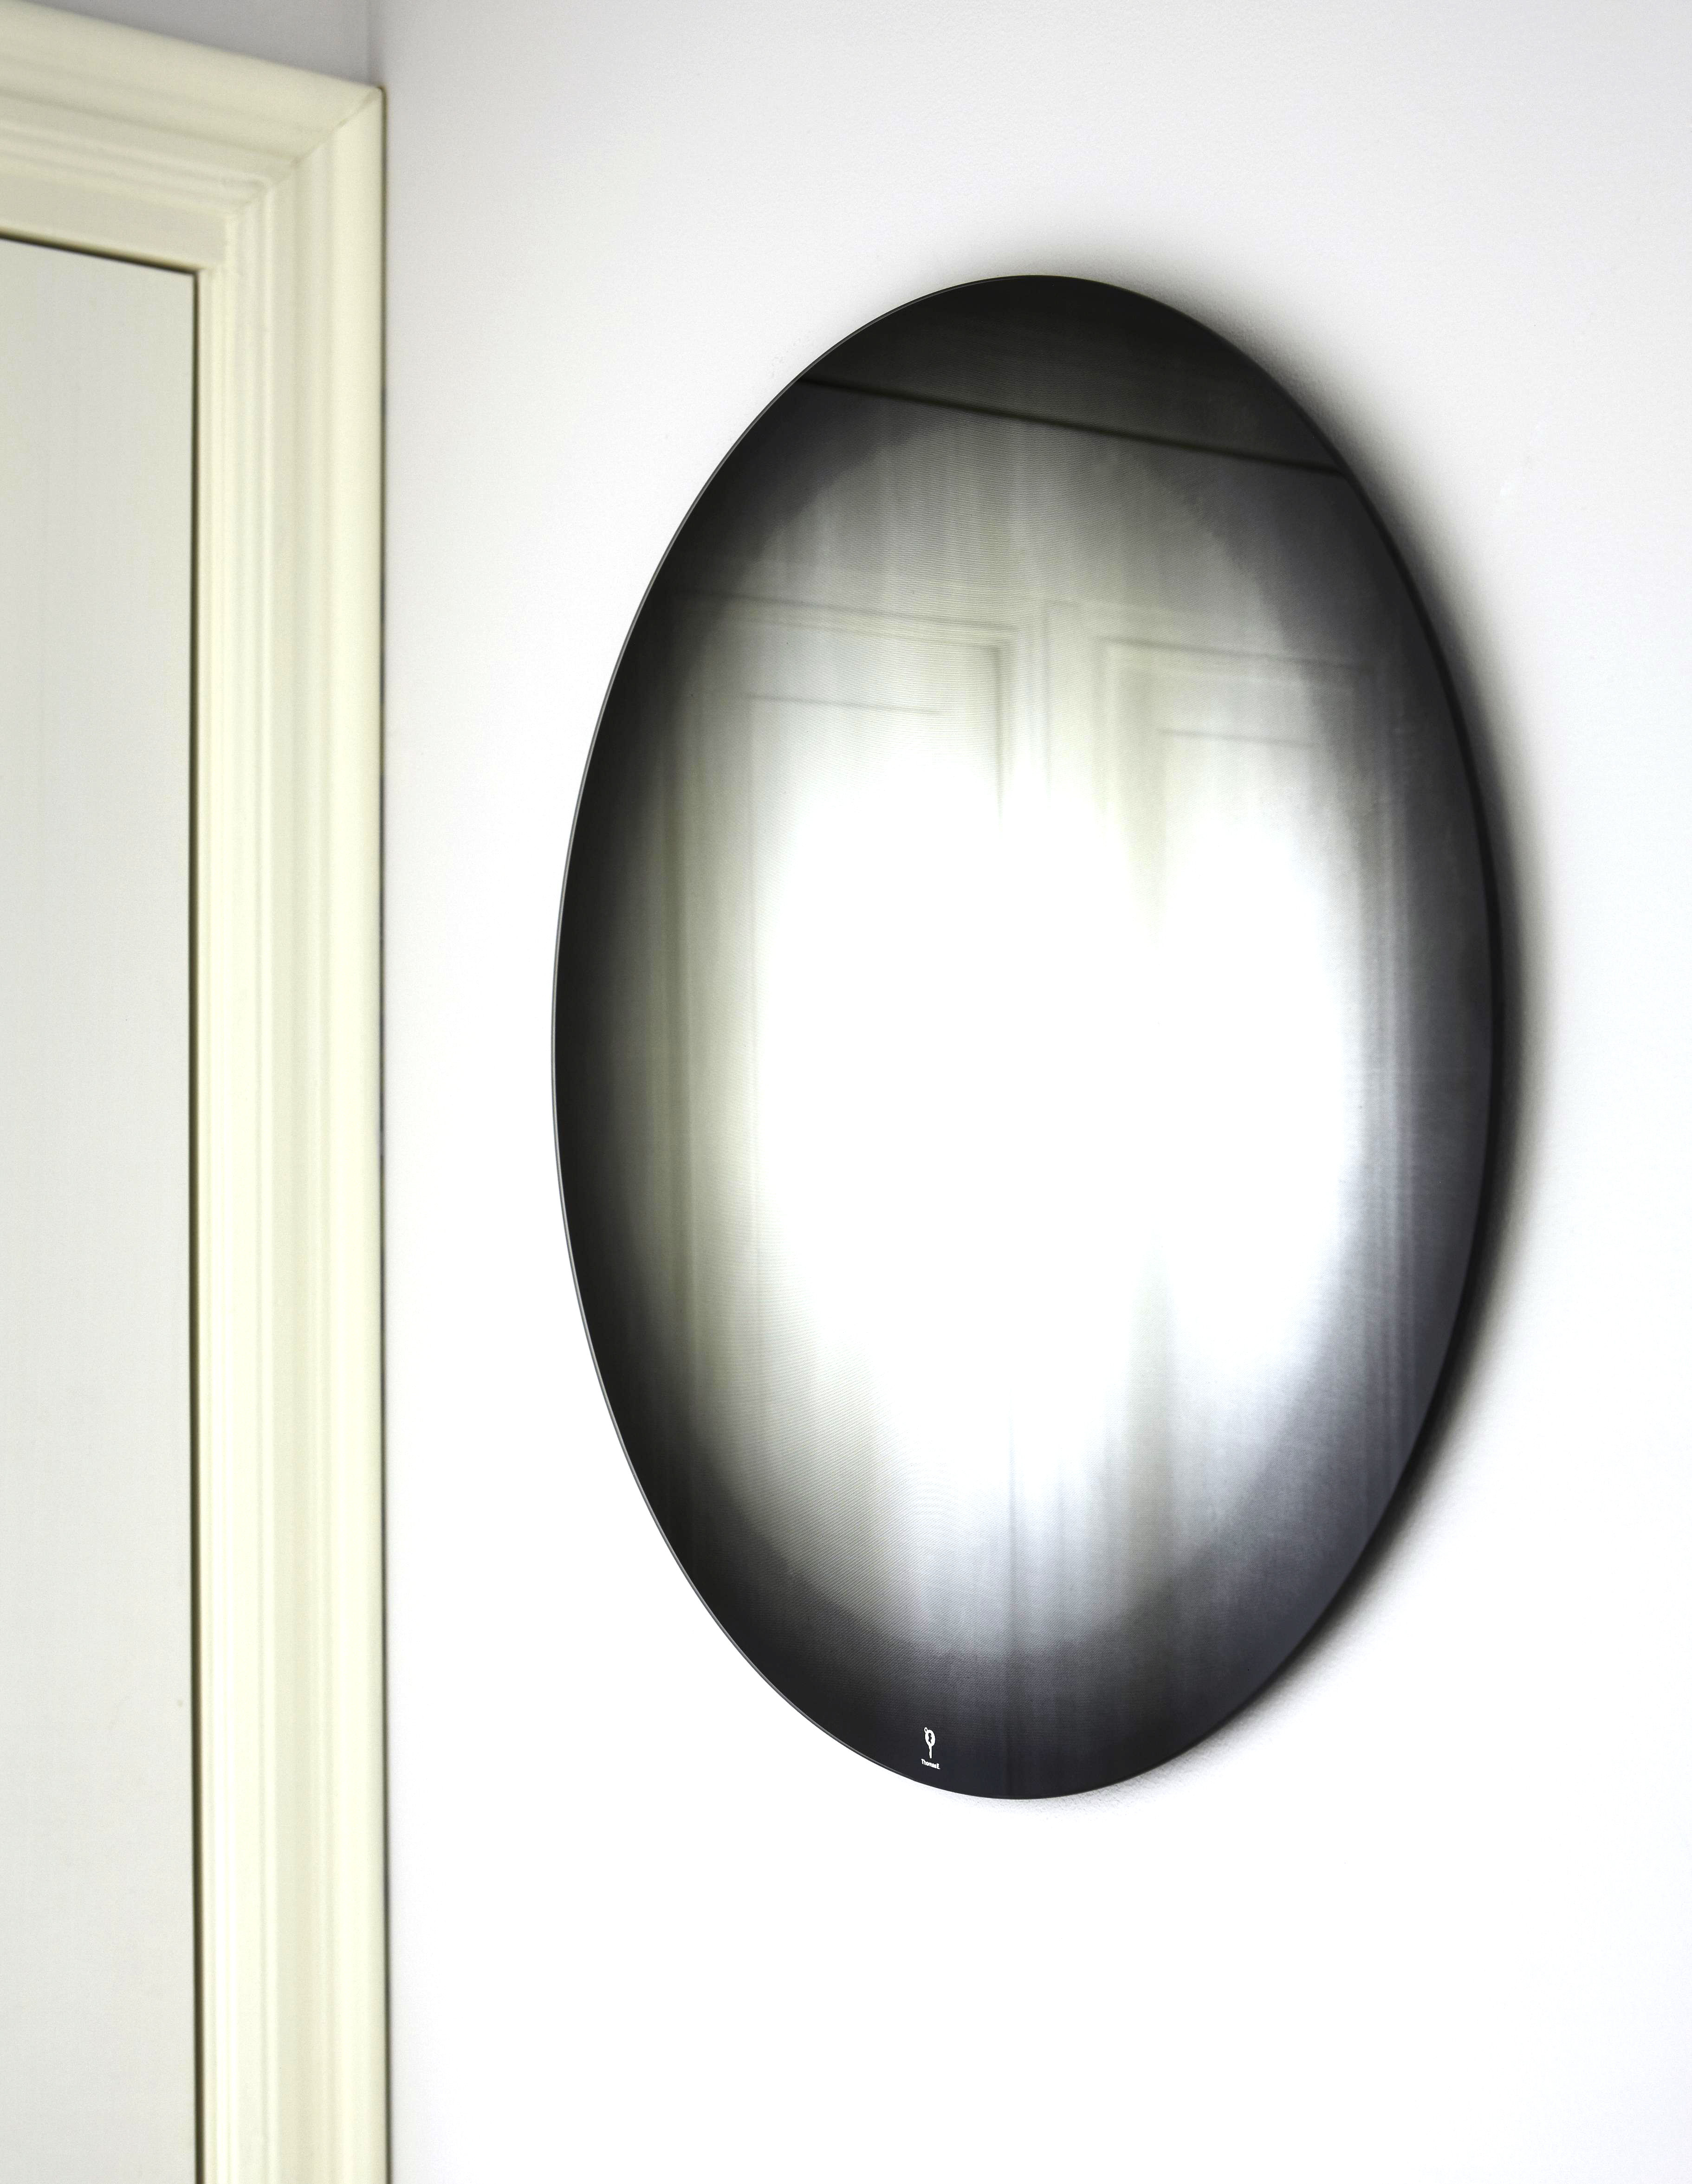 Furniture - Mirrors - Fading Small Wall mirror - Ø 55 cm by ENOstudio - Black - Glass, Silver